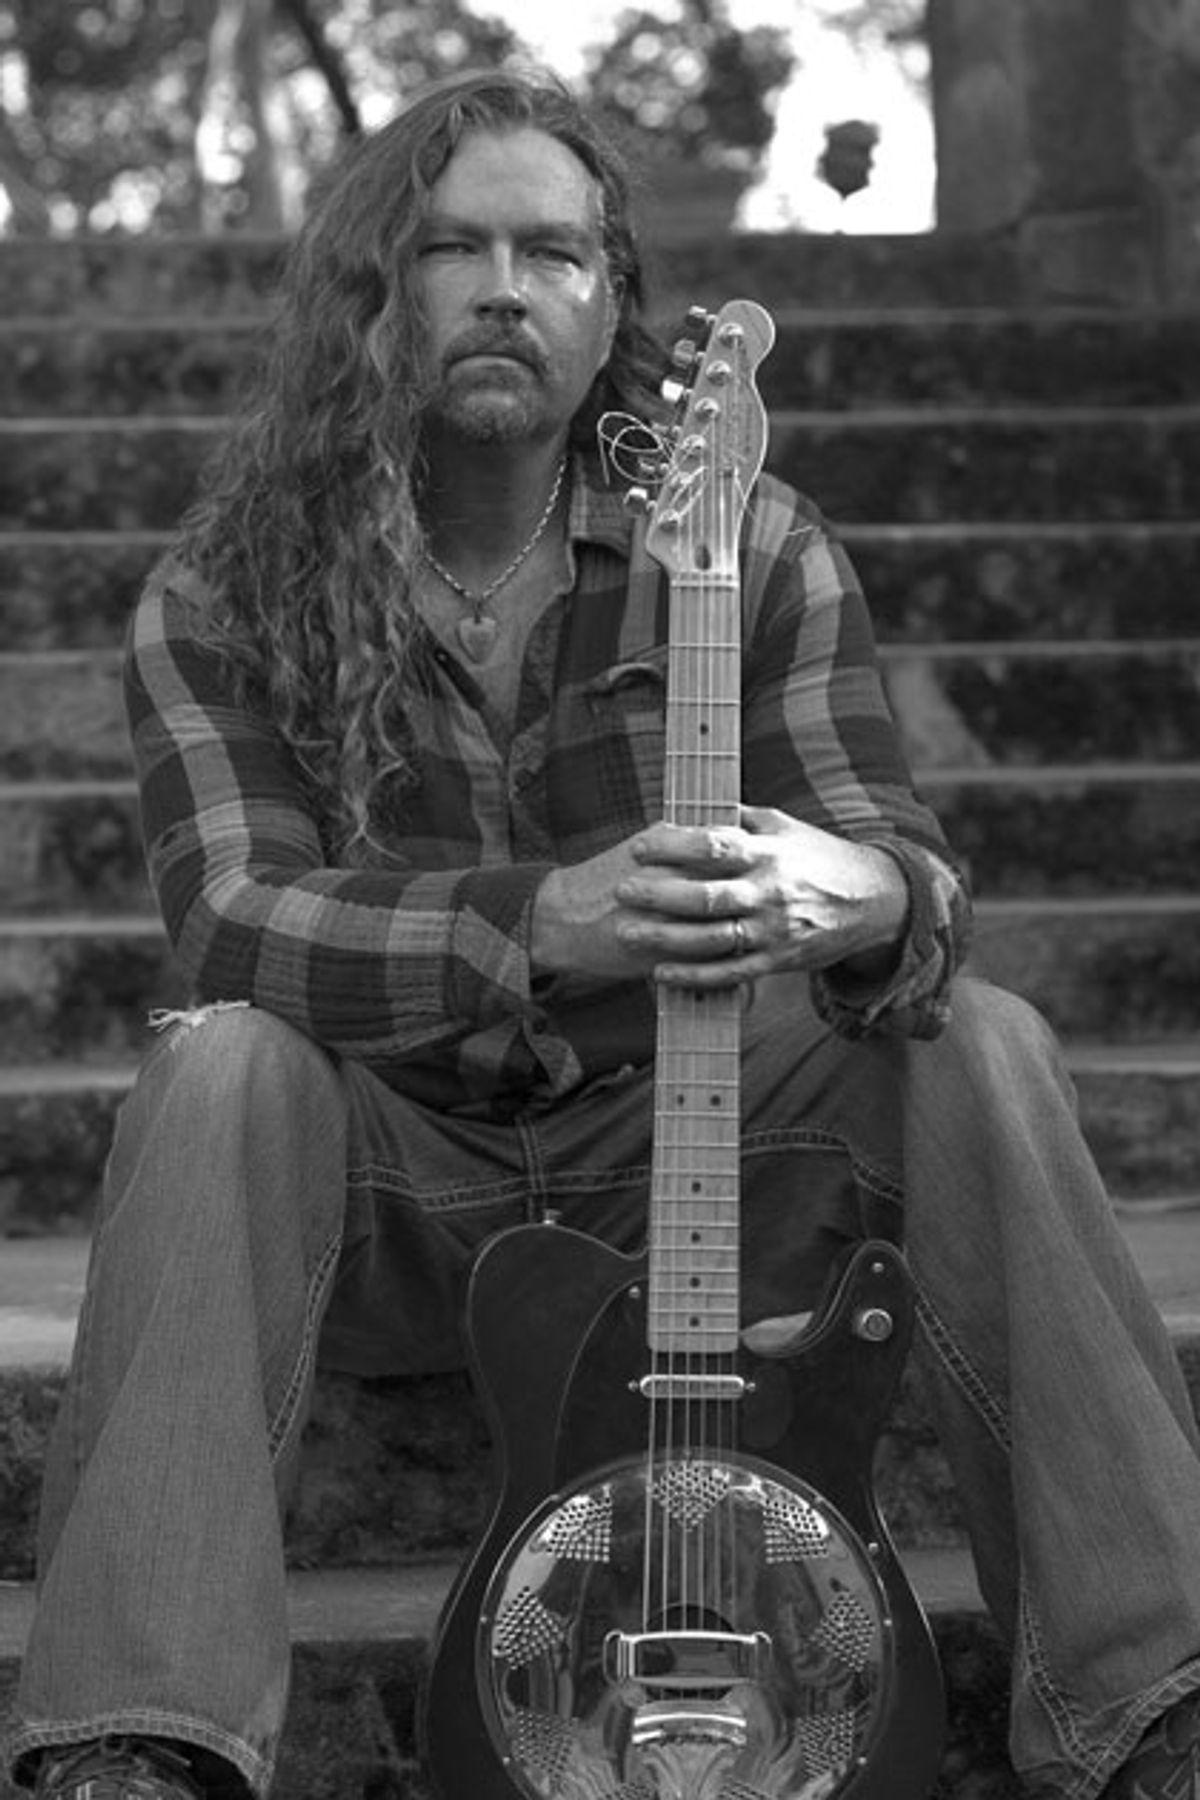 Michael Lee Firkins: Slide Guitar's Backwoods Paganini